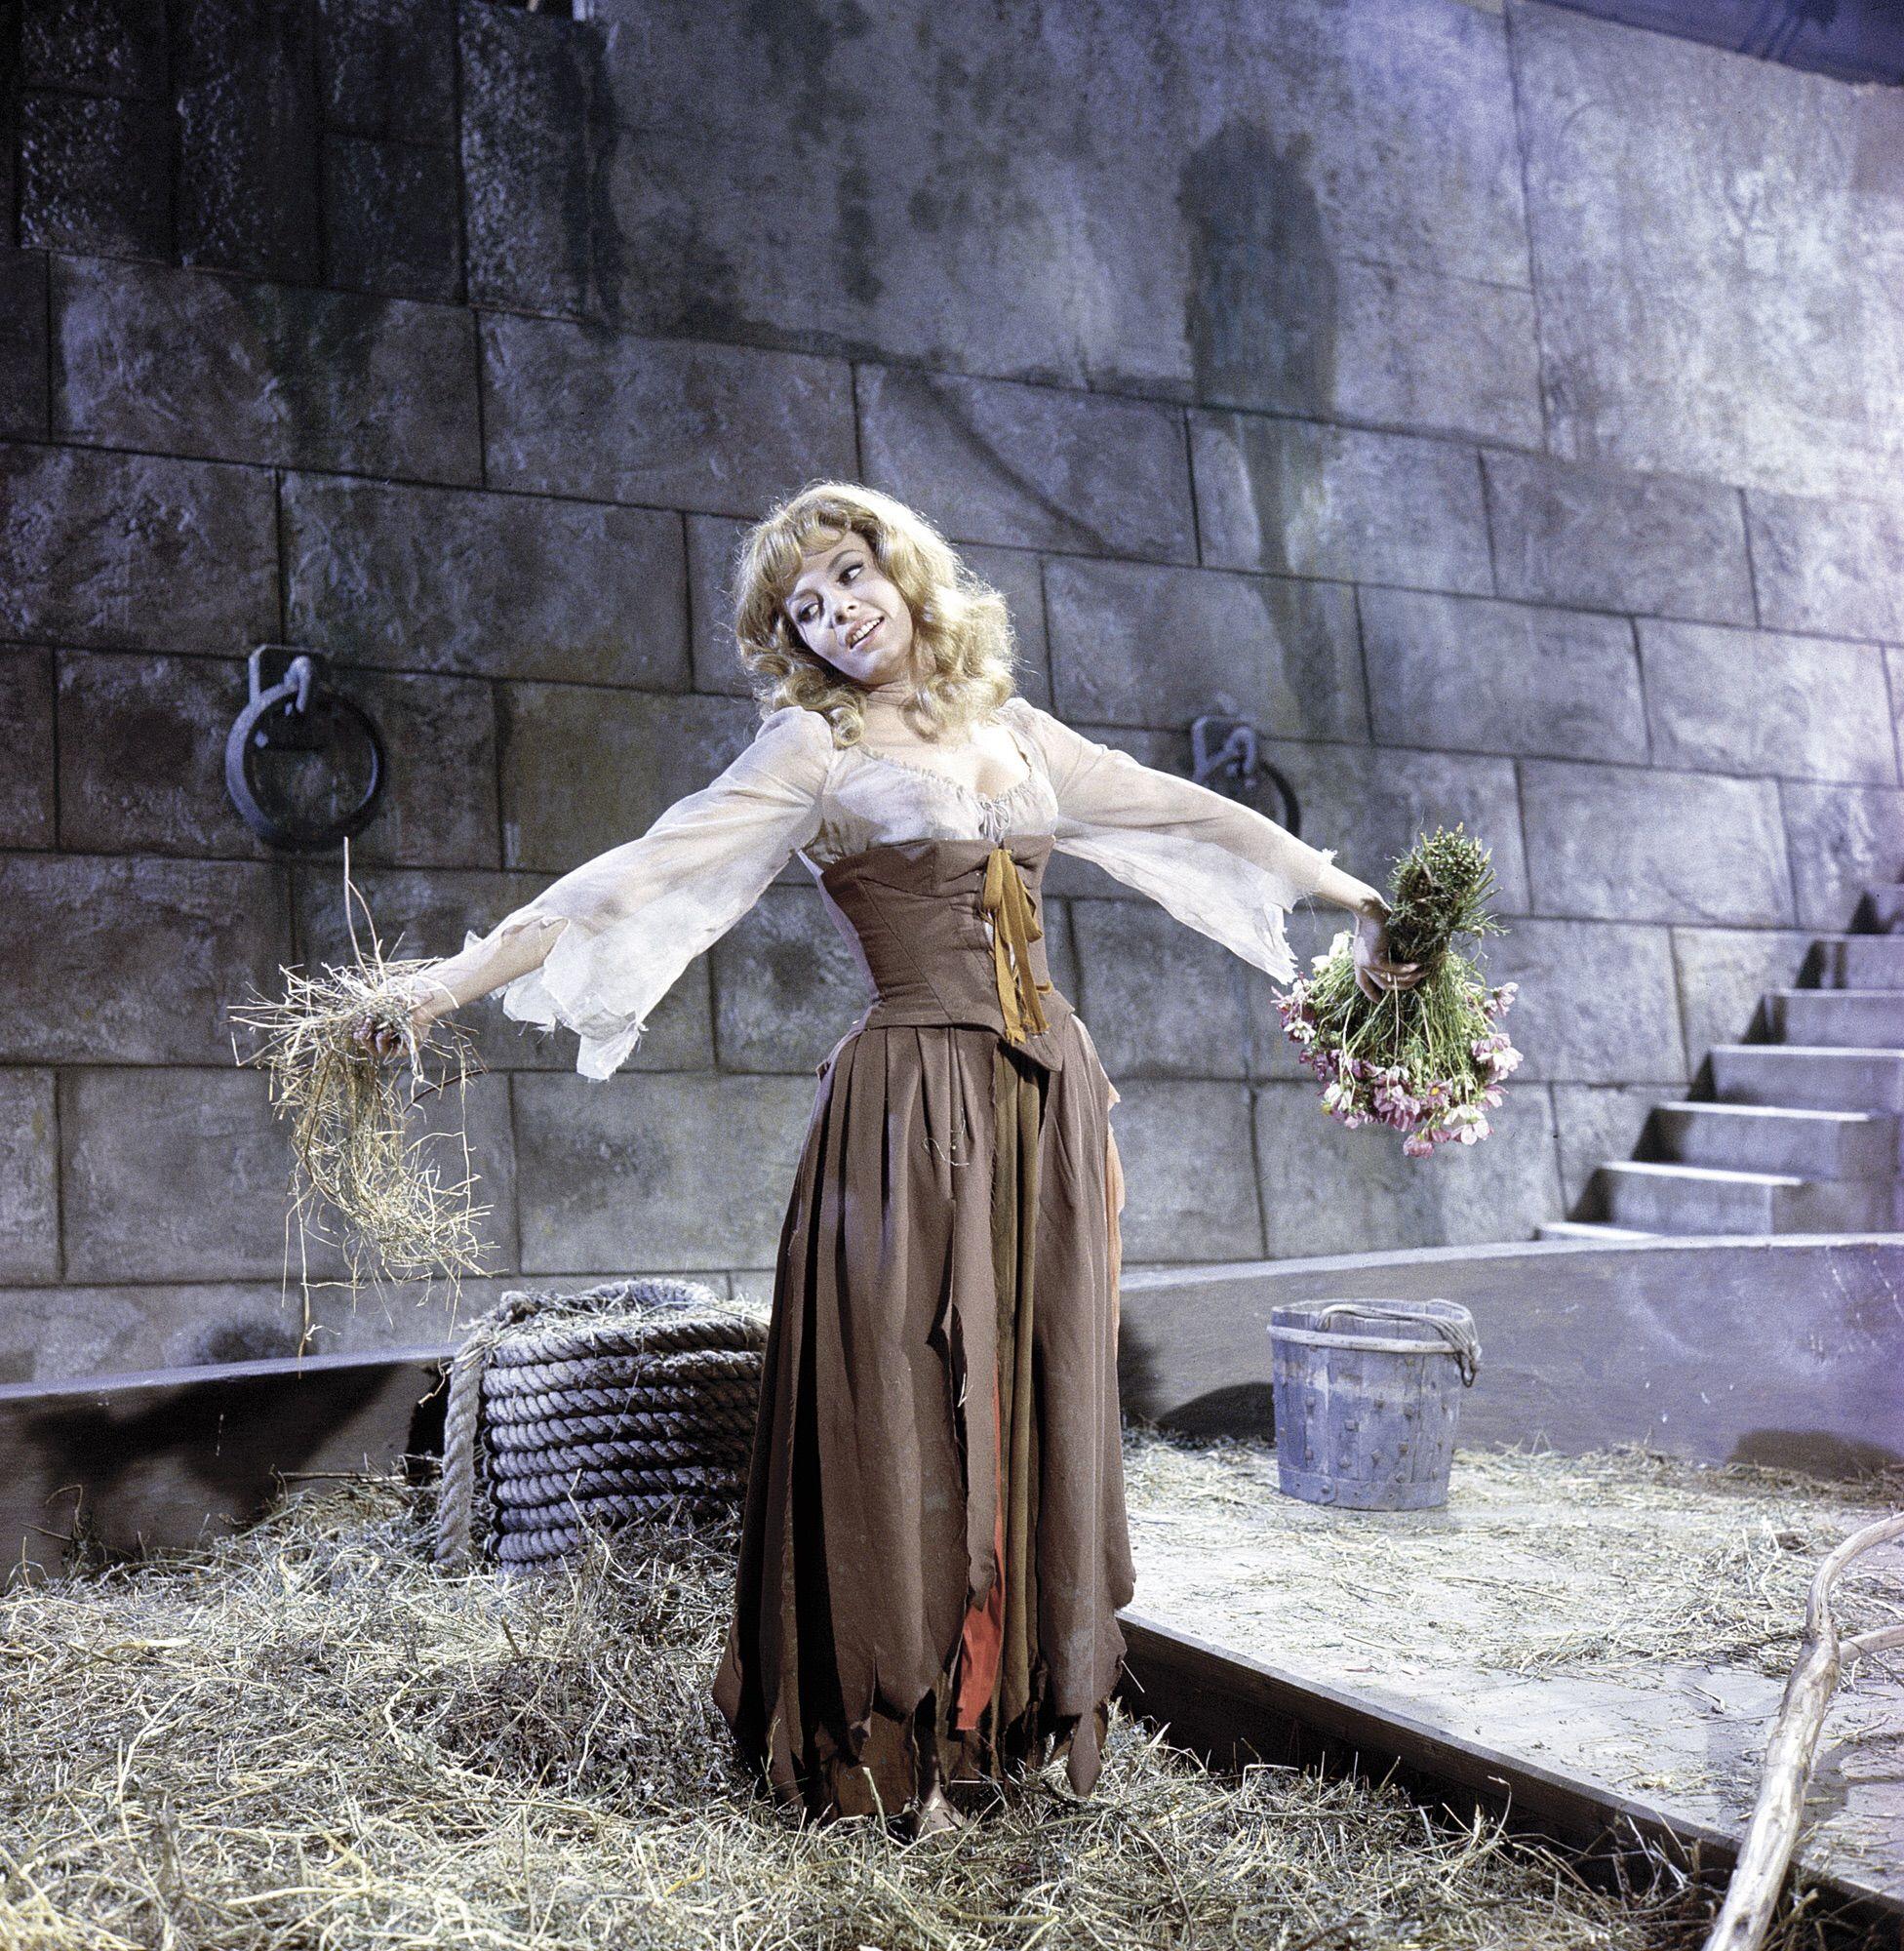 Michèle Mercier in Merveilleuse Angélique directed by Bernard Borderie, 1965